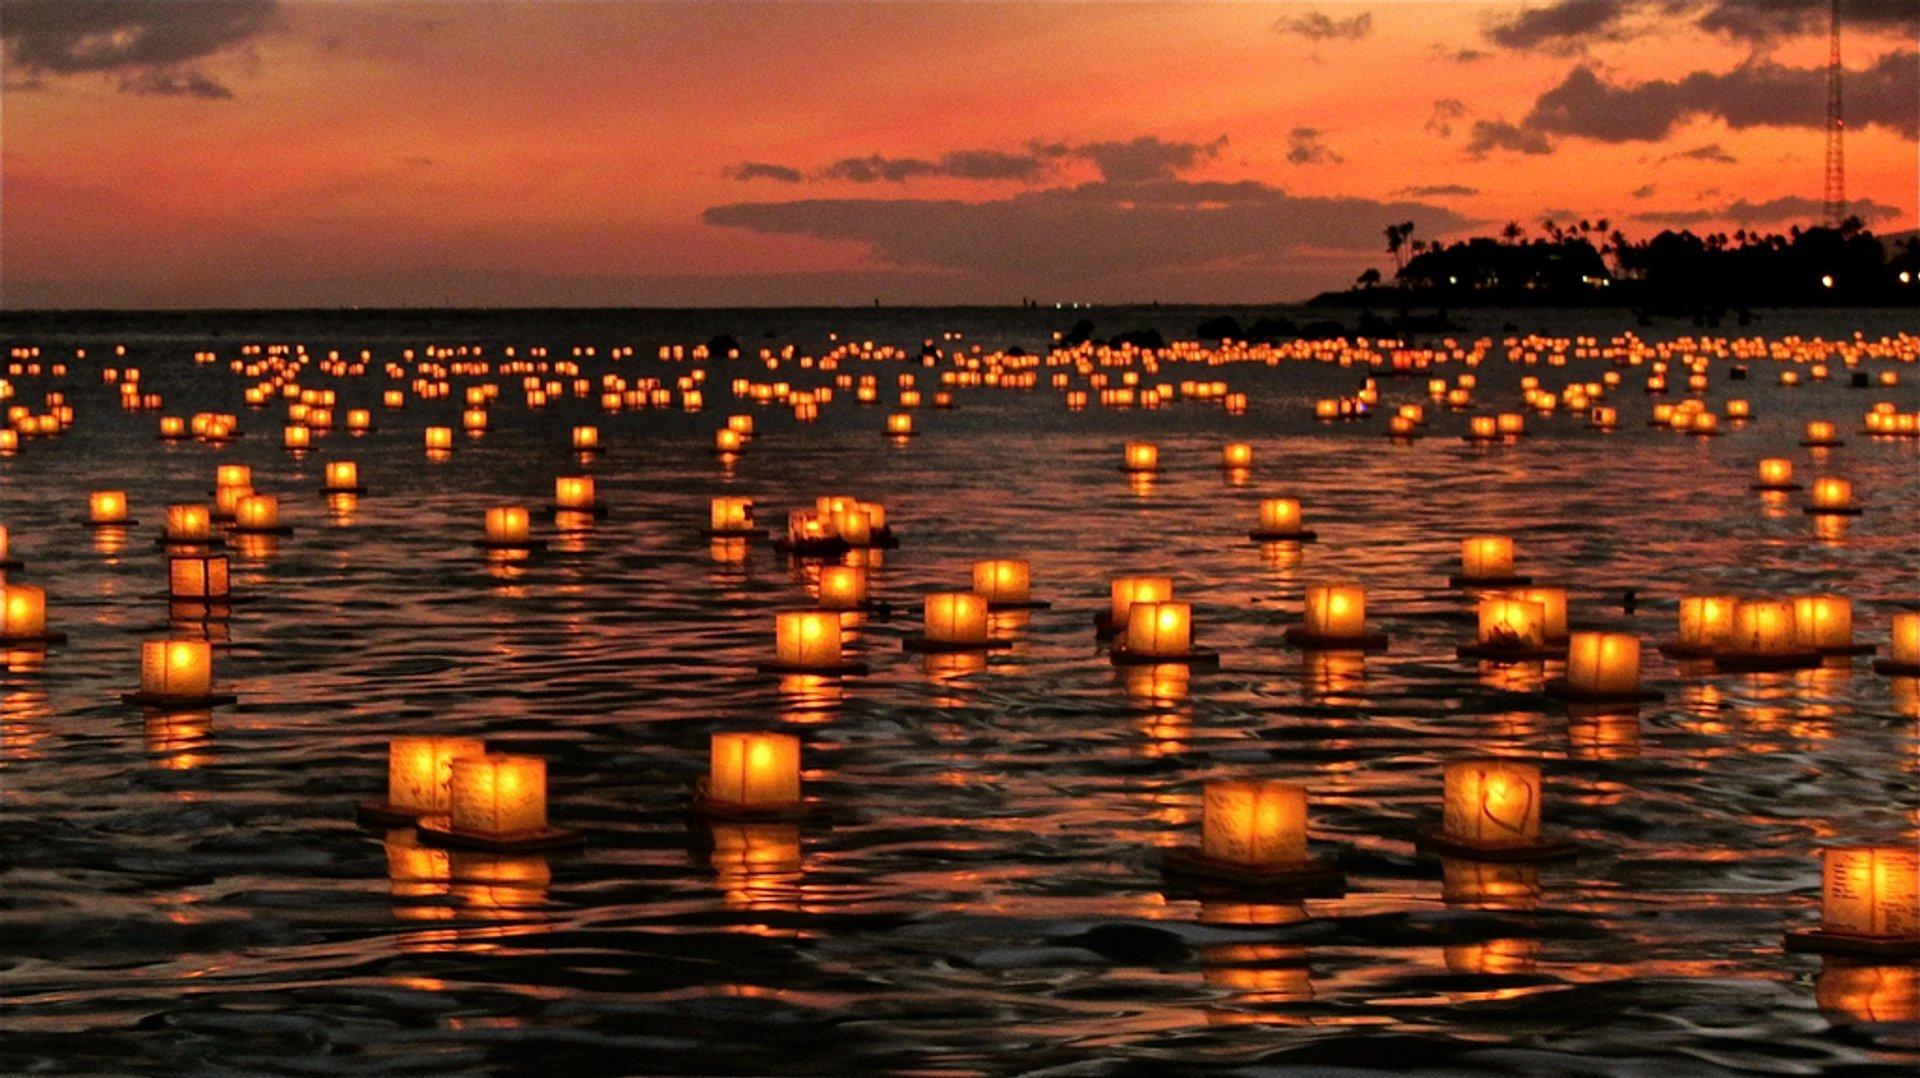 Lantern Floating Hawaii in Hawaii 2019 - Best Time